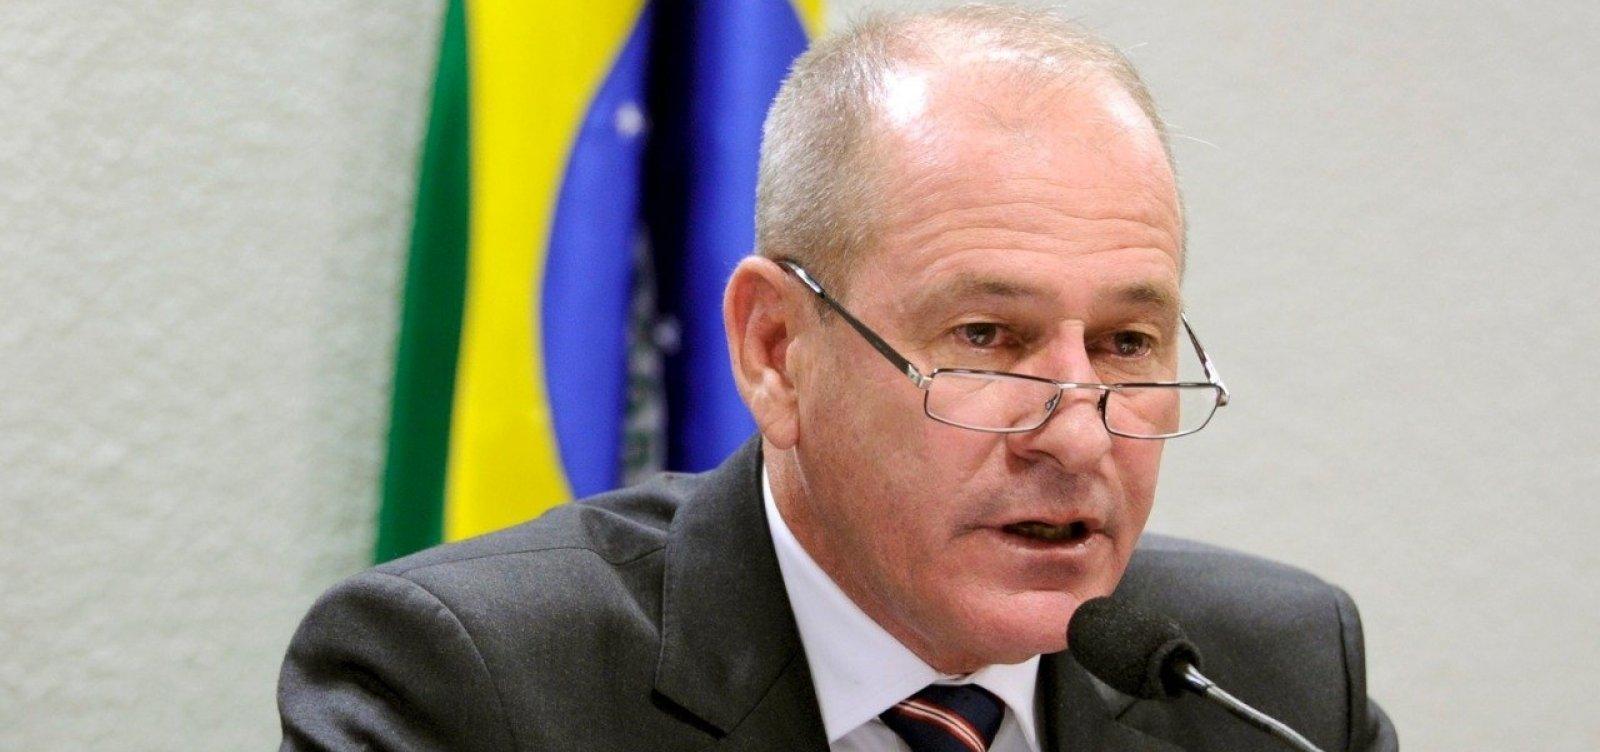 Futuro ministro da Defesa anuncia novos comandantes das Forças Armadas; confira